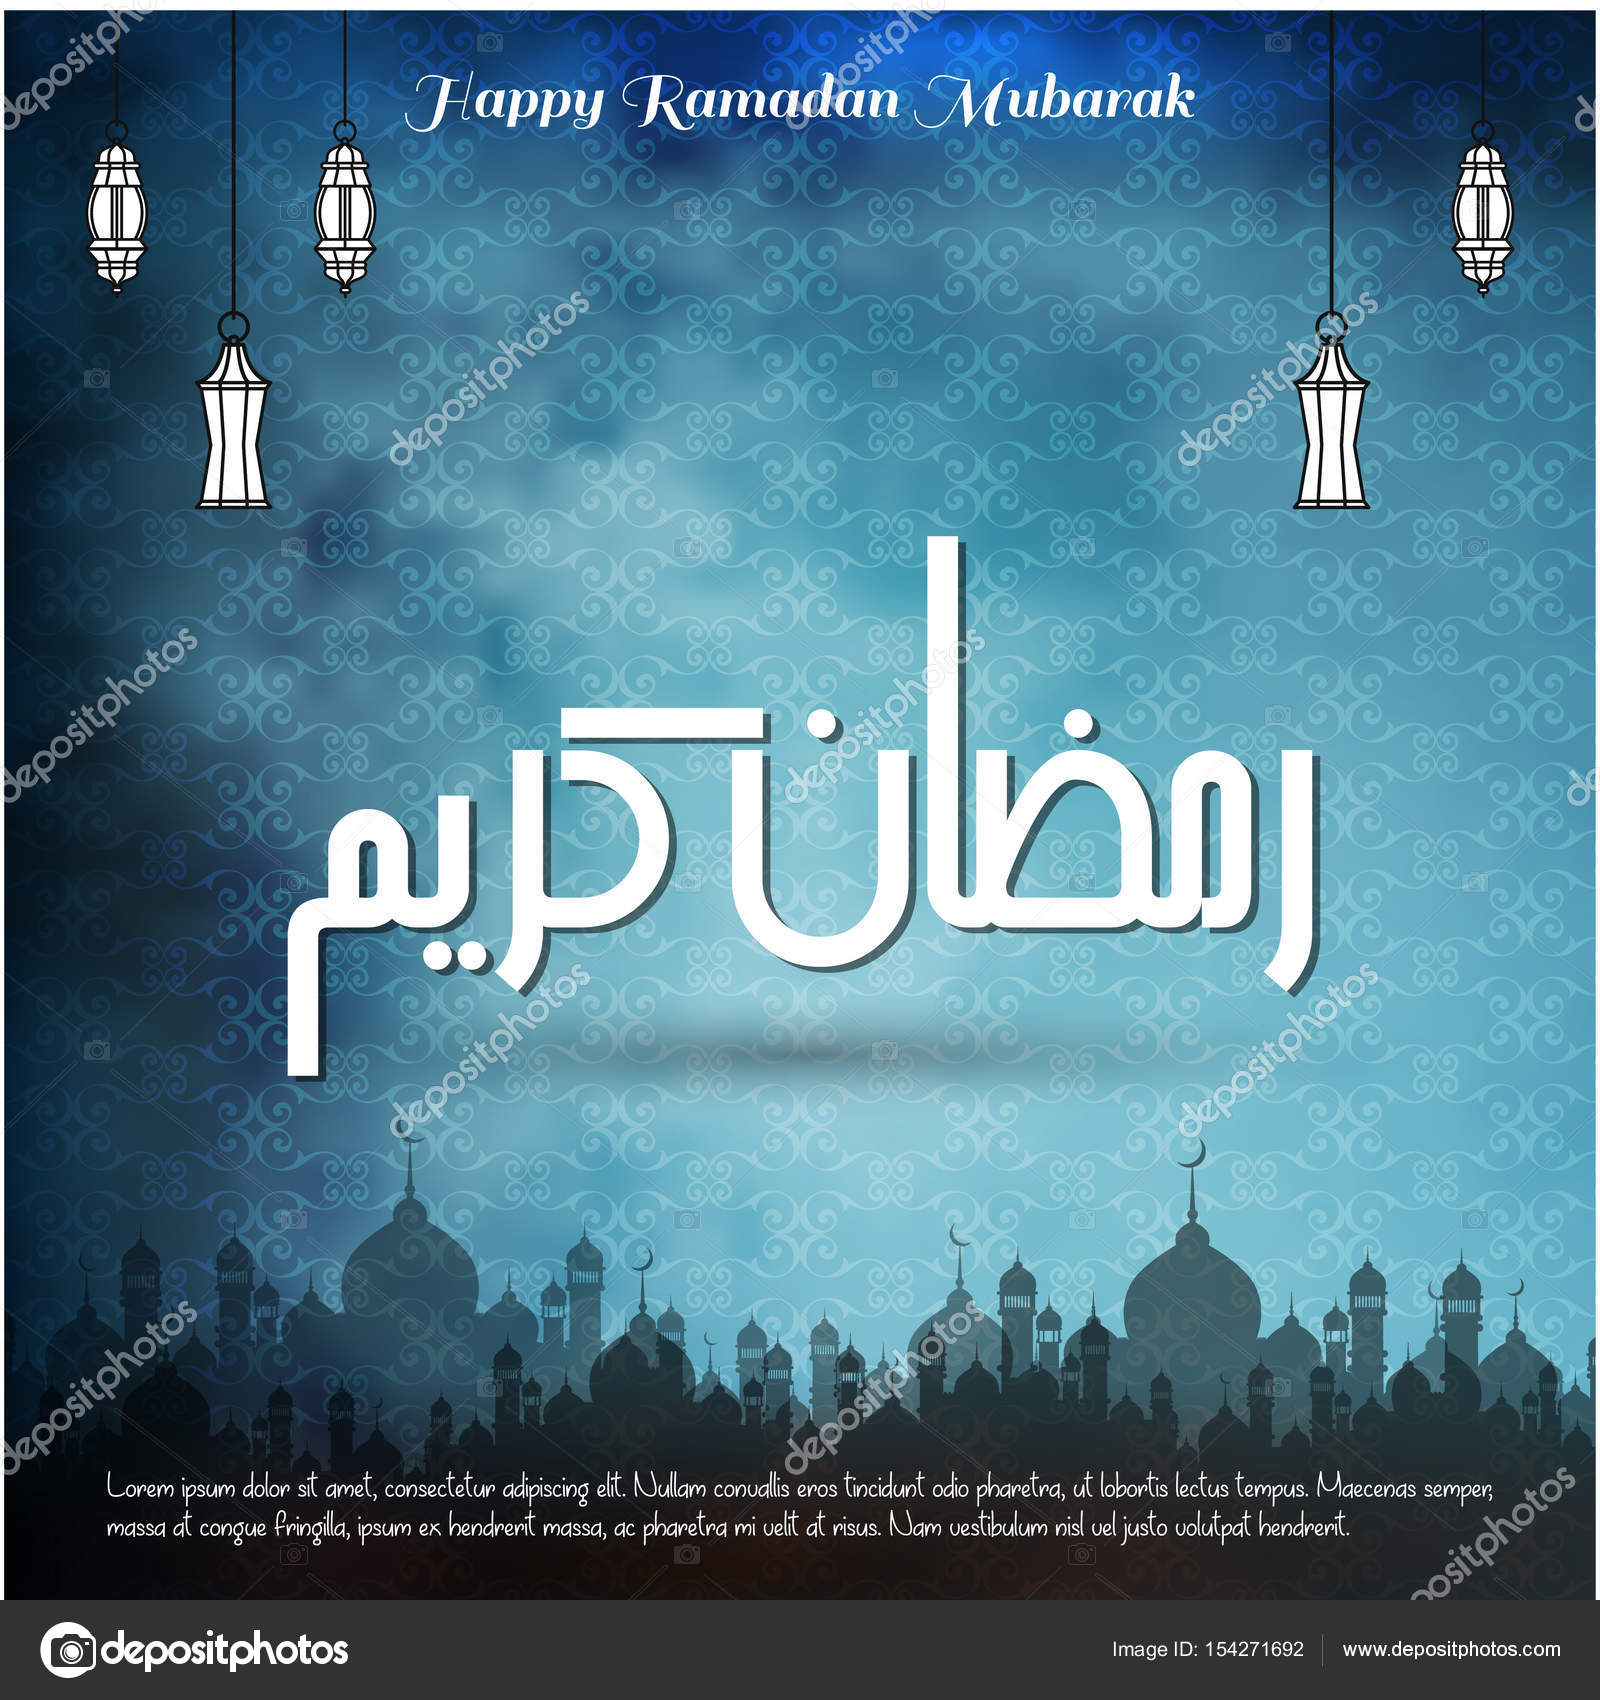 Ramadan mubarak greeting card stock vector ibrandify 154271692 ramadan mubarak greeting card stock vector 154271692 m4hsunfo Choice Image